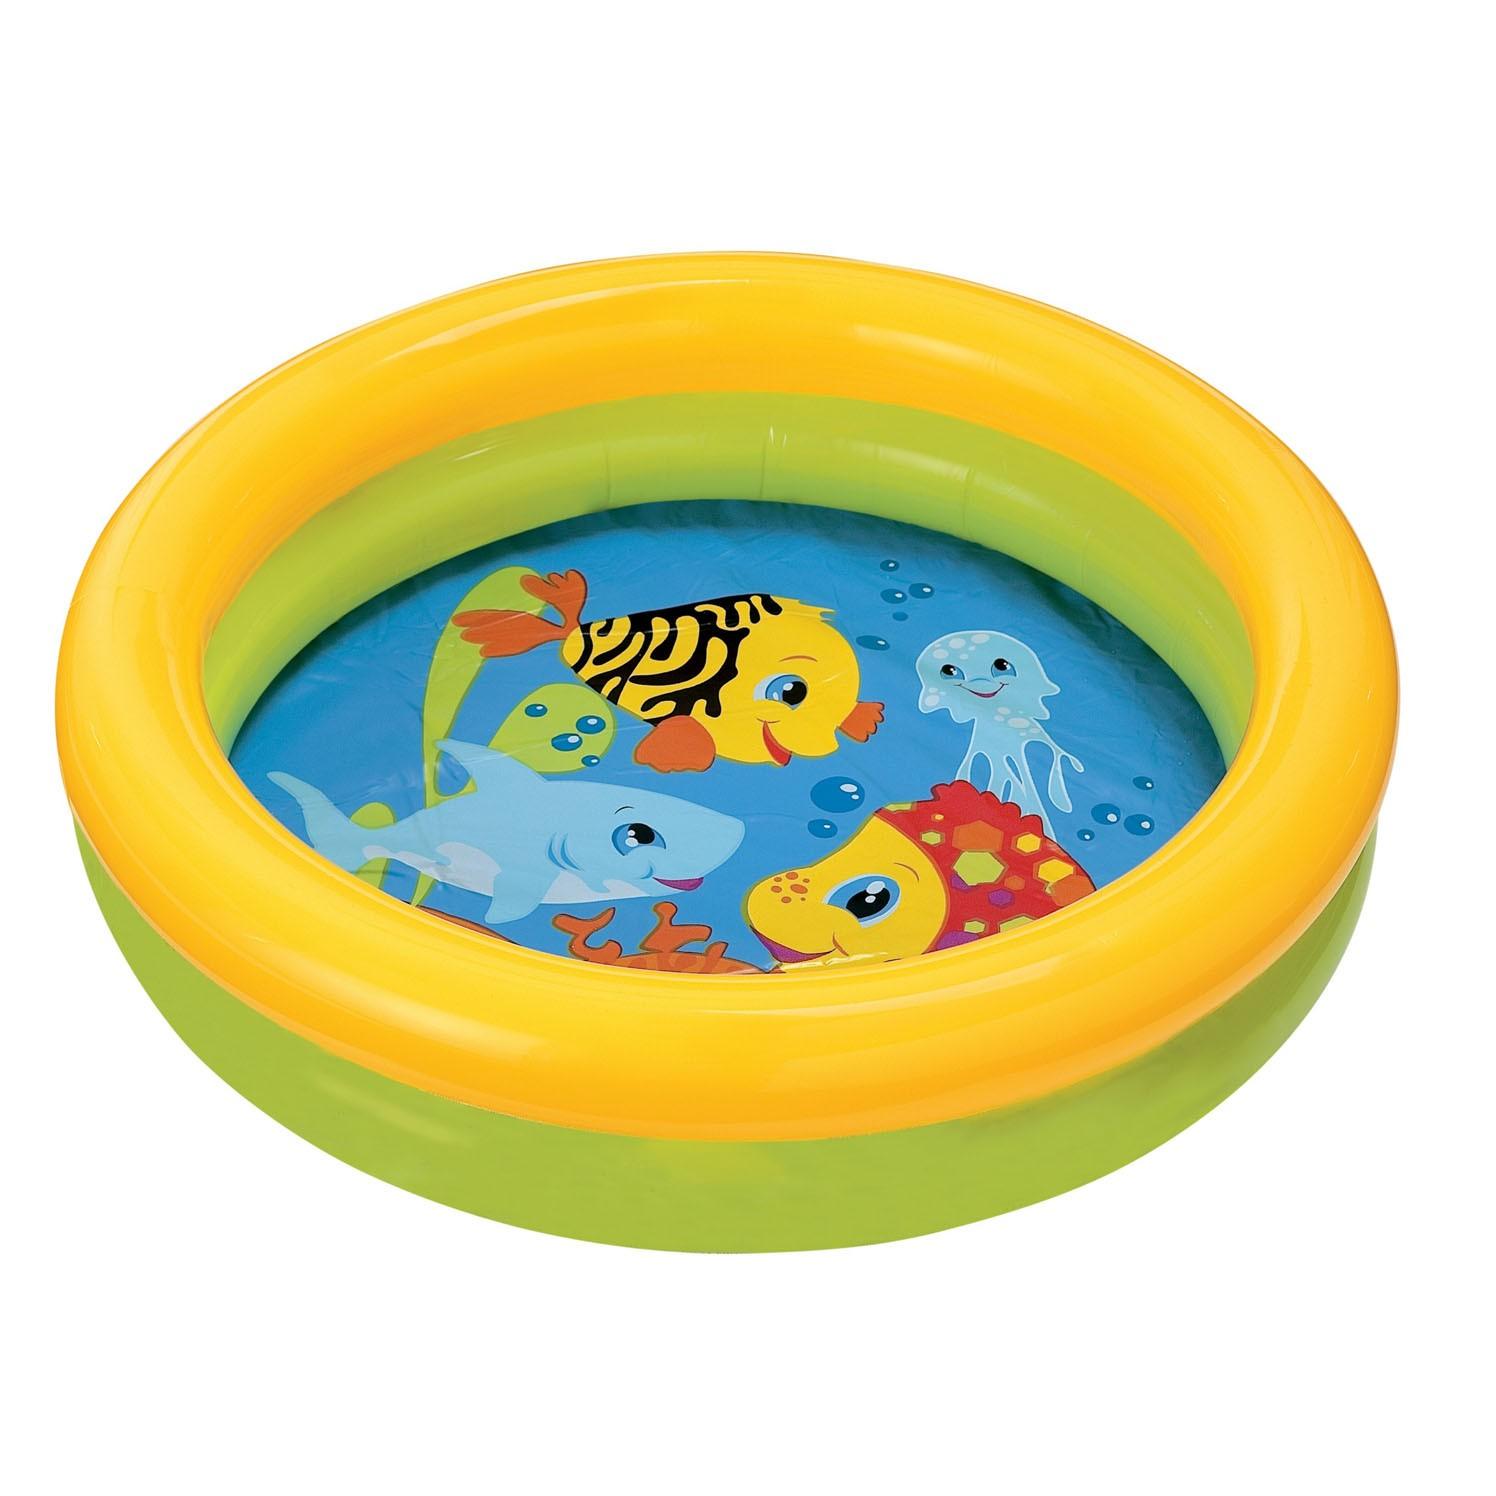 Dedeman piscina gonflabila intex my first pentru copii for Piscina inflable intex para bebe